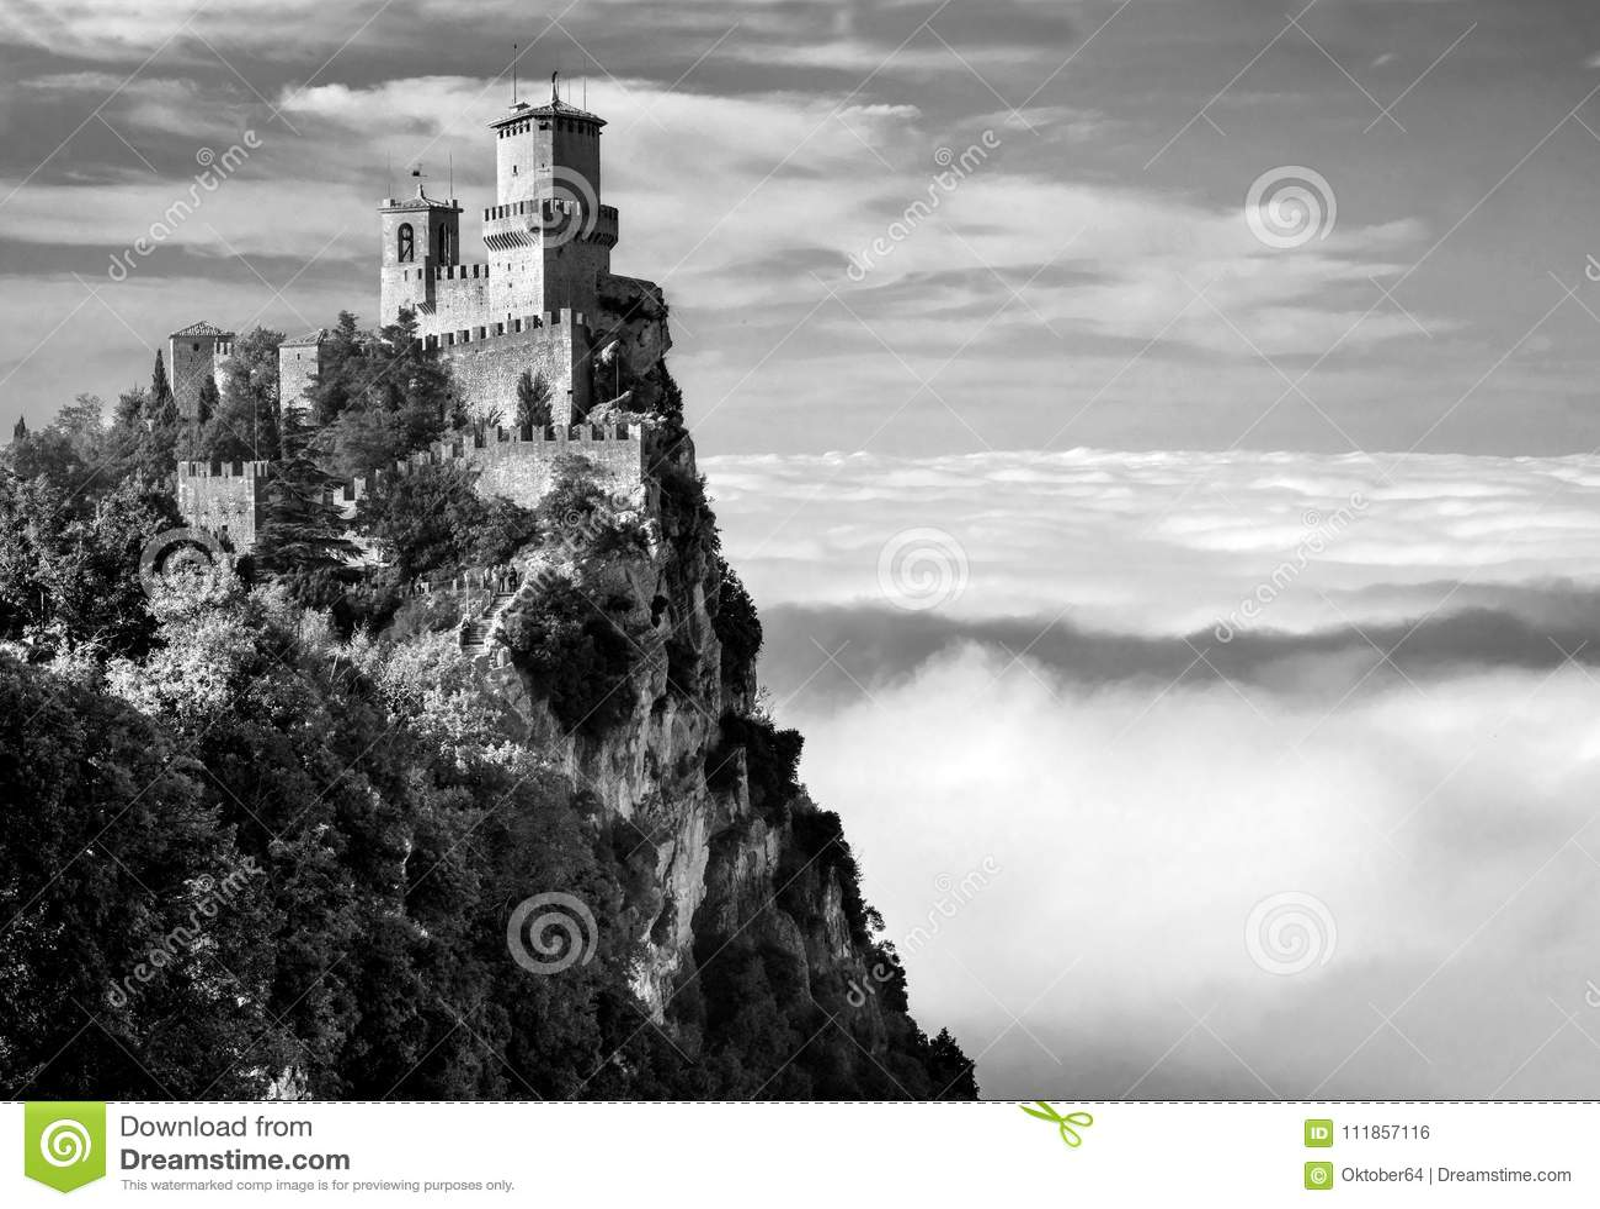 Della Guaita, το αρχαιότερο φρούριο Rocca του Άγιου Μαρίνου, Ιταλία Γραπτή φωτογραφία του Πεκίνου, Κίνα